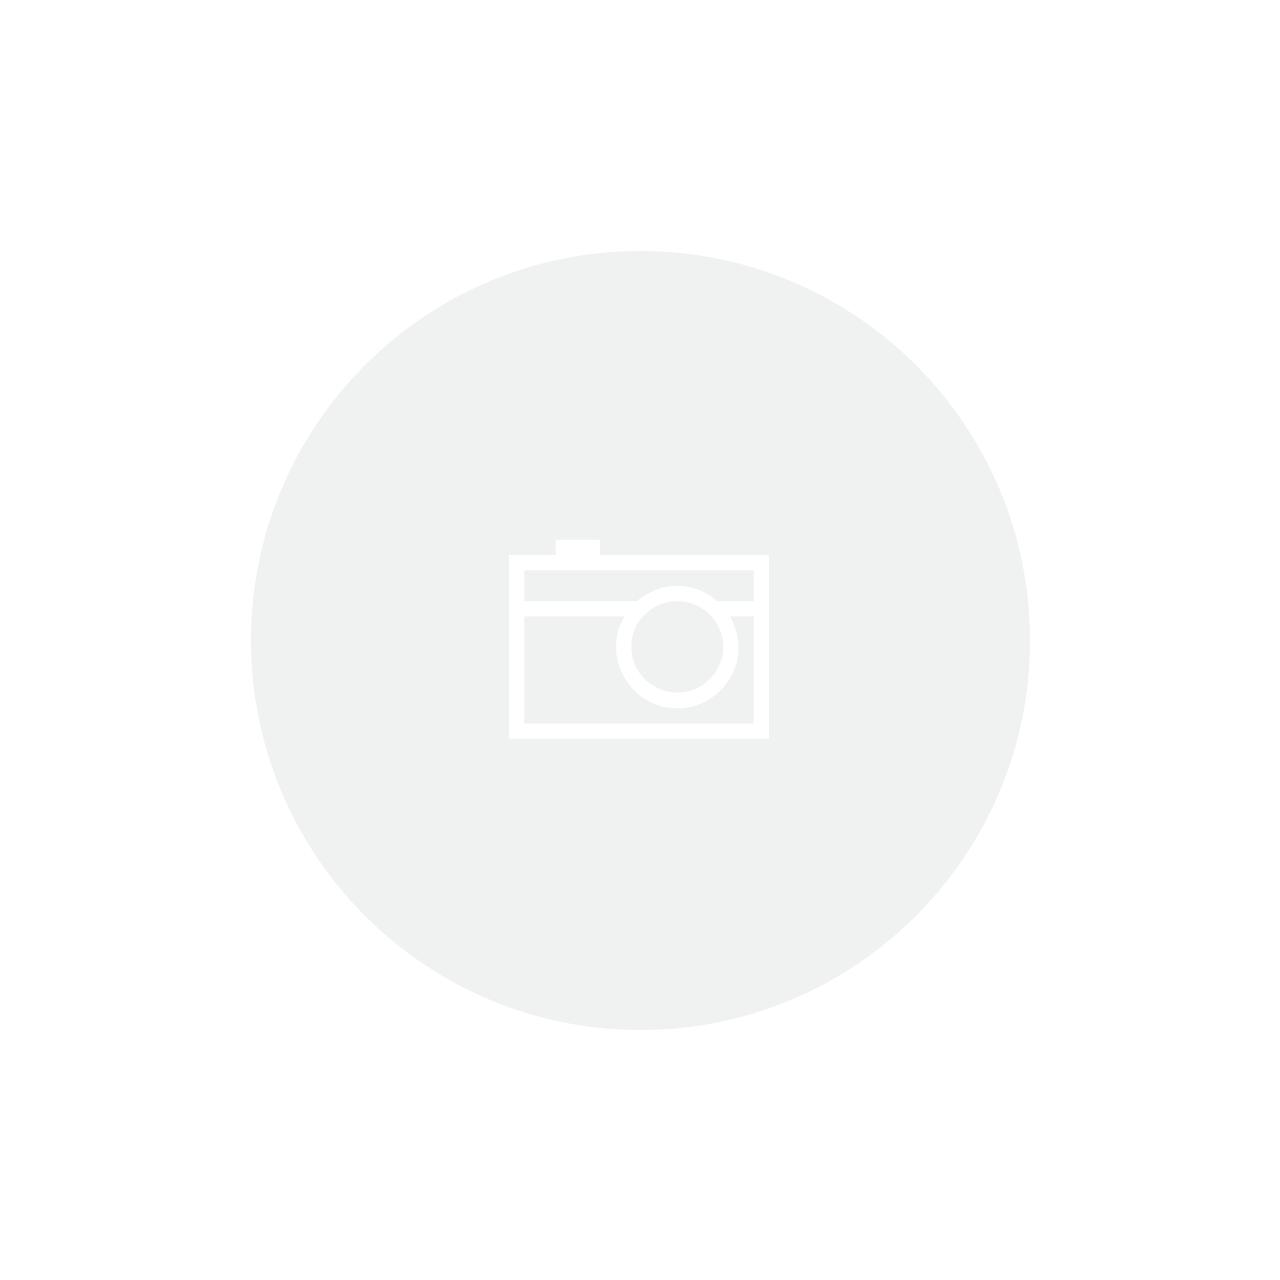 Regatinha MH 051VF16